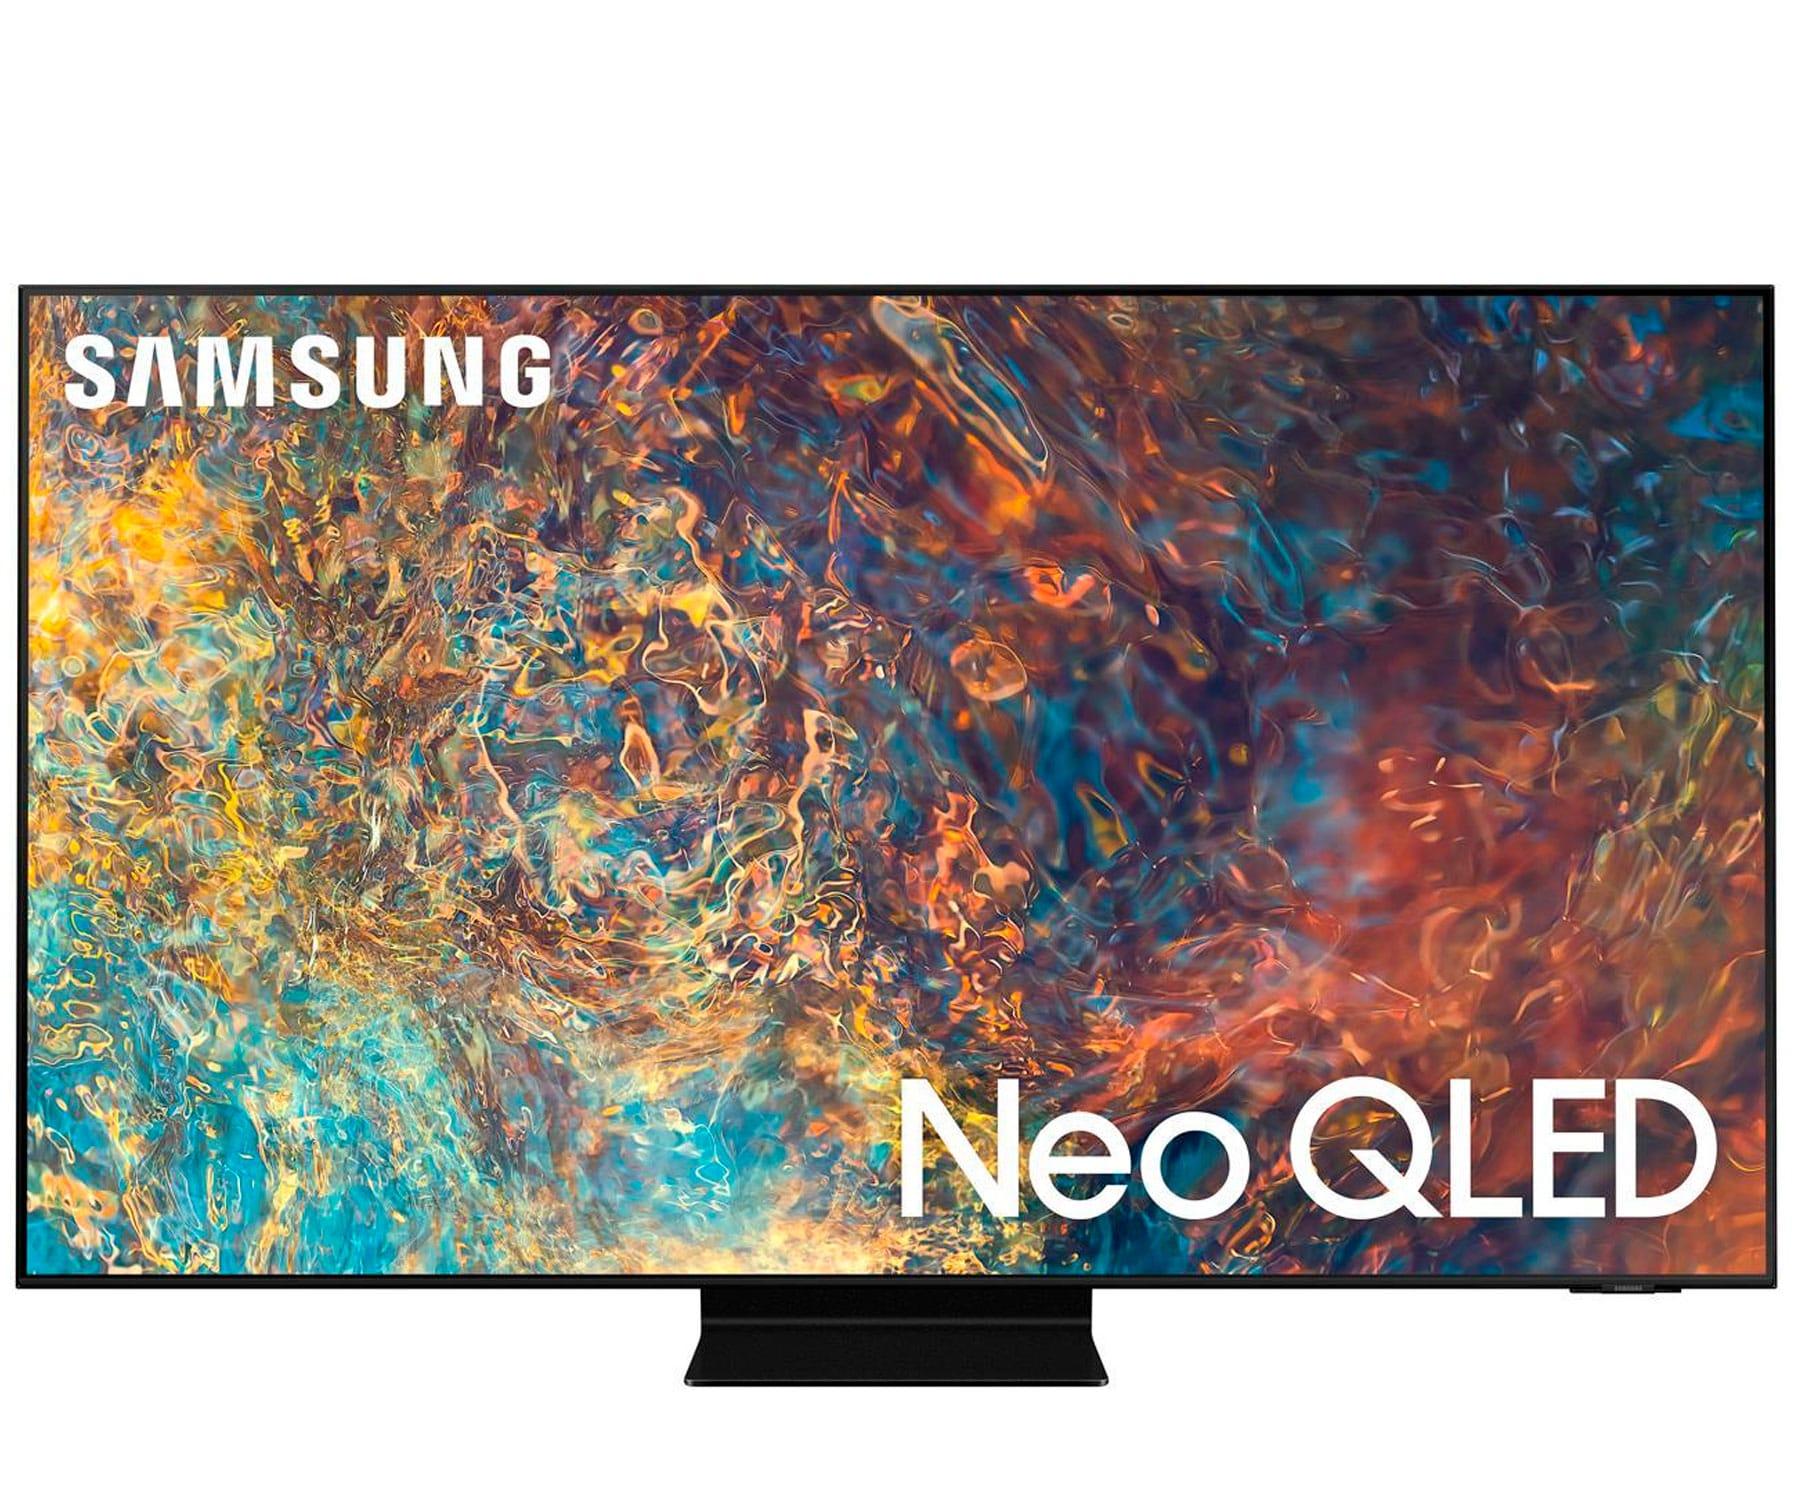 SAMSUNG QE65QN90AATXXC 2020 TELEVISOR 65'' Neo QLED 4K Quantum HDR 2000 SMART TV 4500Hz PQI AMBIENT MODE